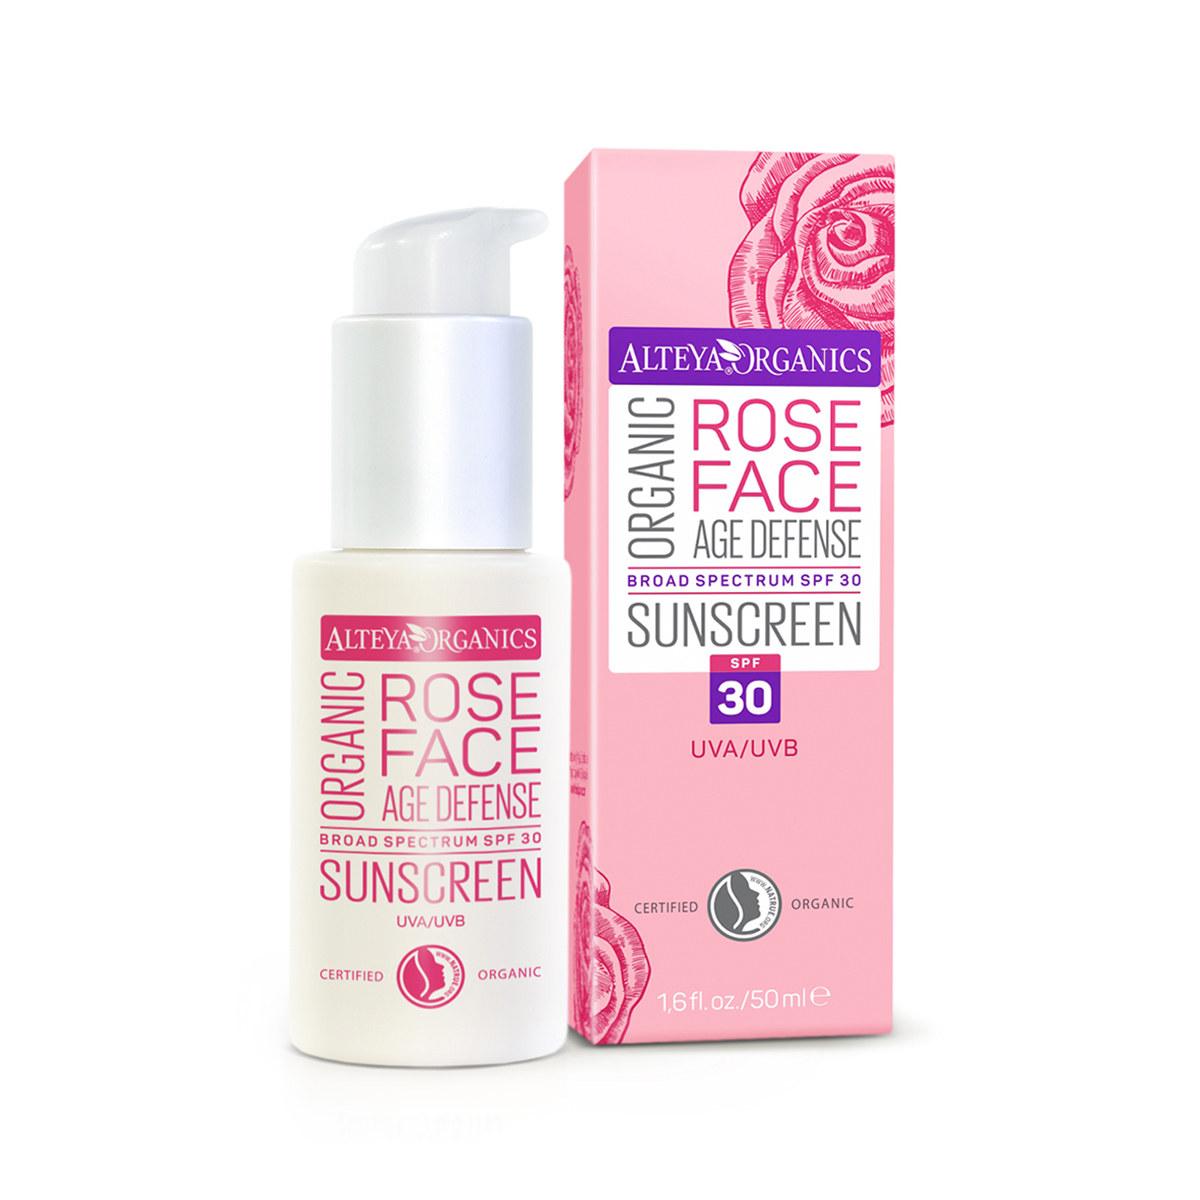 Bio organic sun protection face cream with SPF30 Alteya Organics